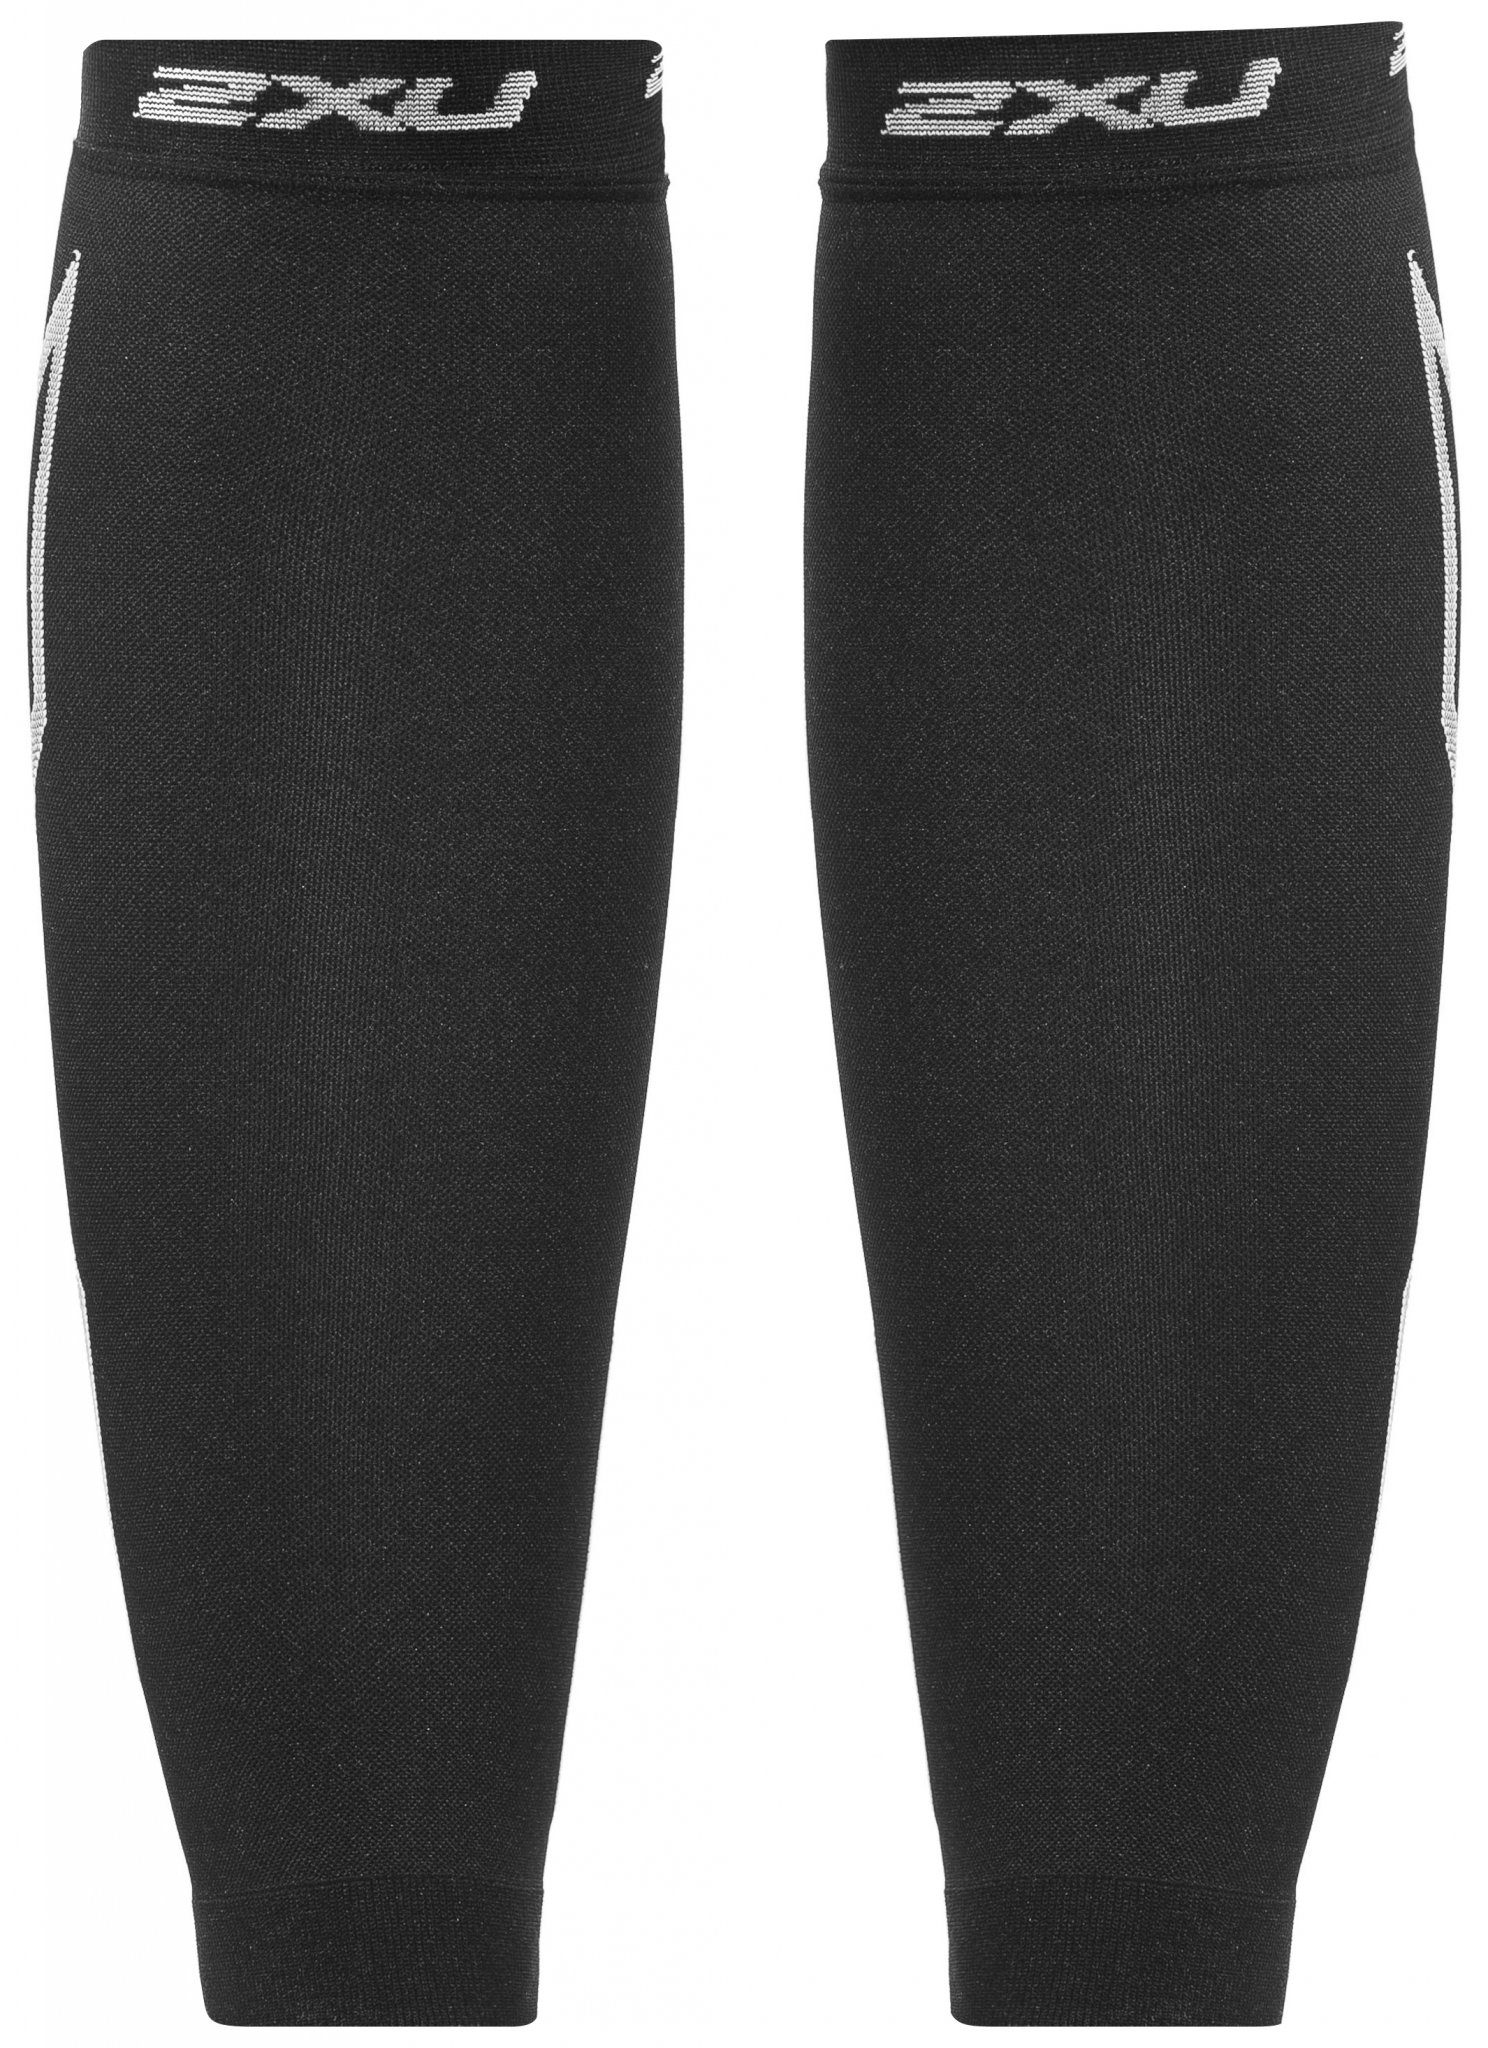 2xU Armling »Compression Calf Sleeves Unisex«